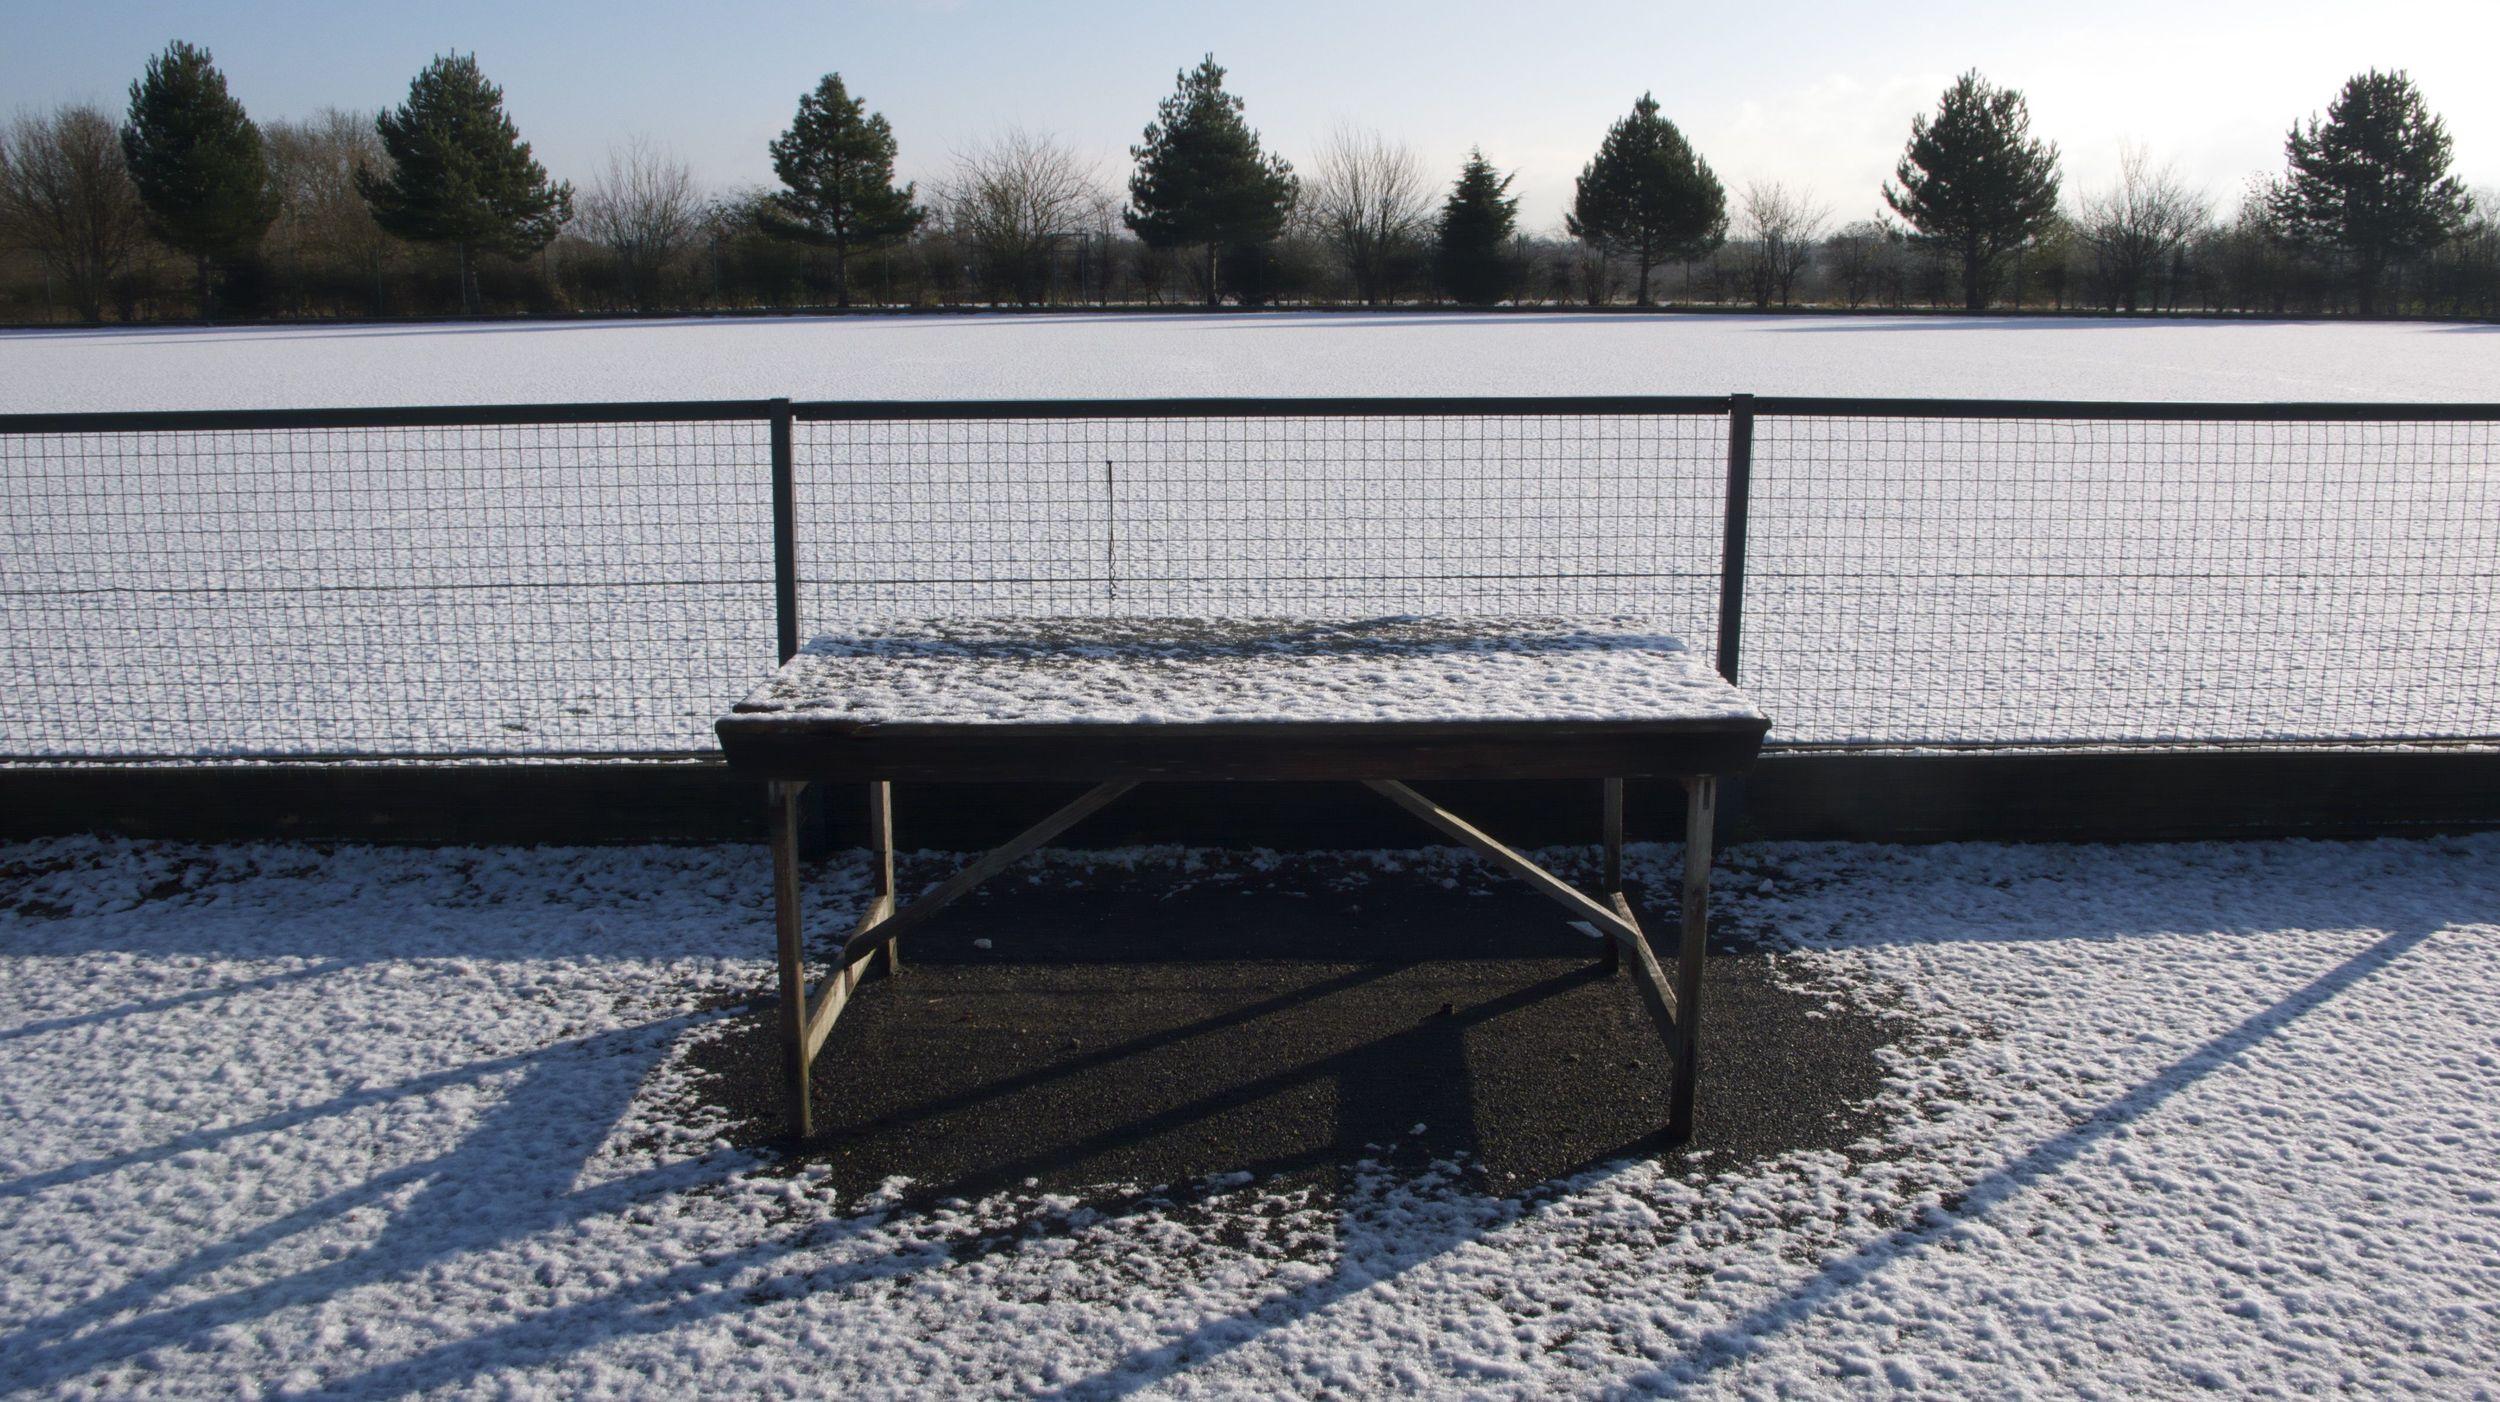 St. Catharine's Sports Field, Cambridge